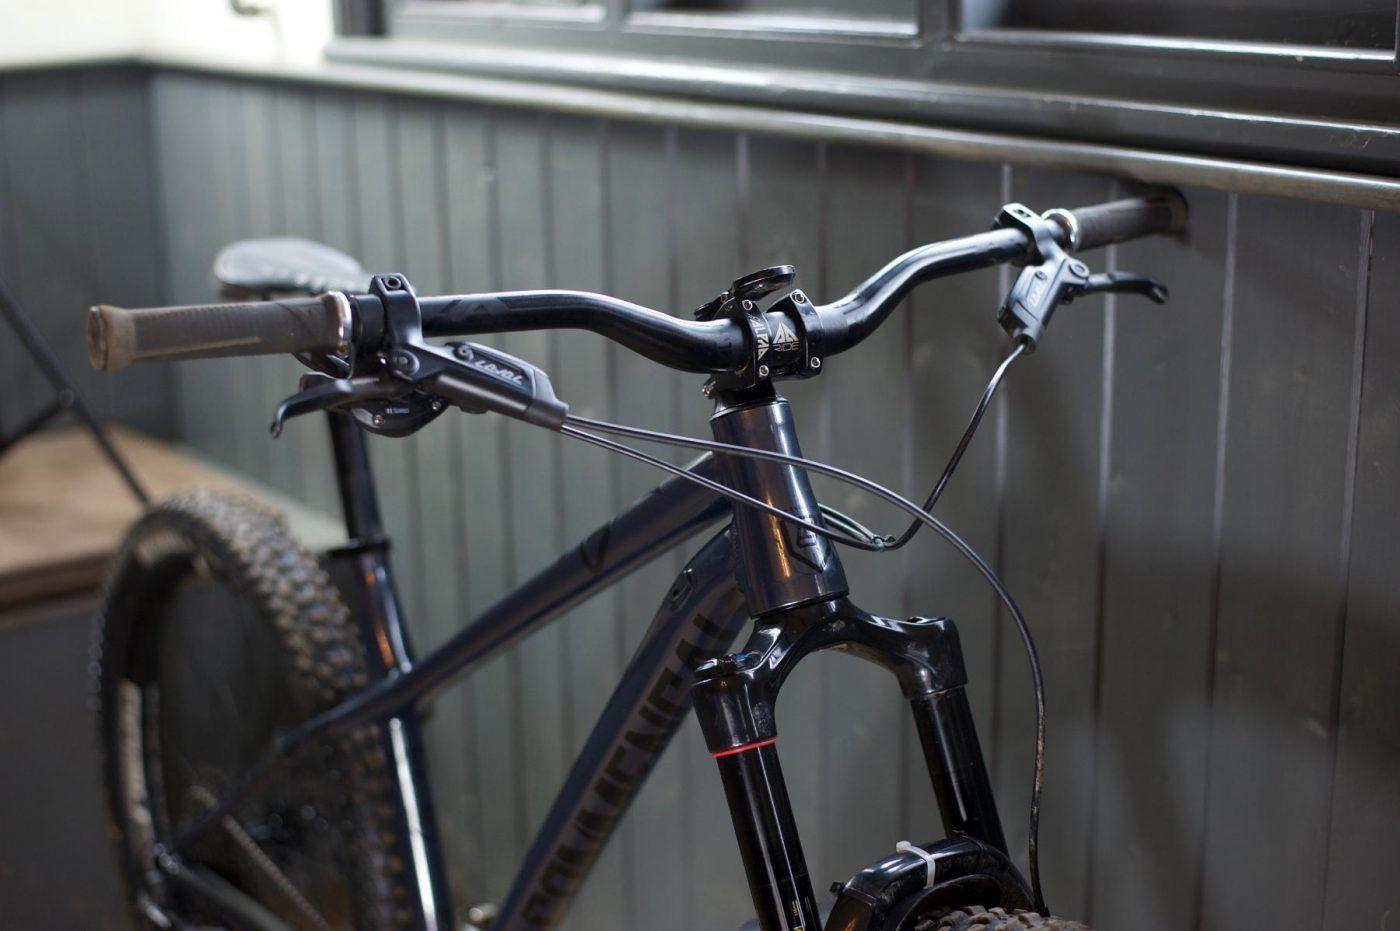 4f17152f74f REVIEW: Commencal Meta HT AM Essential | Bikes | Mtb, Bike, Mountain ...